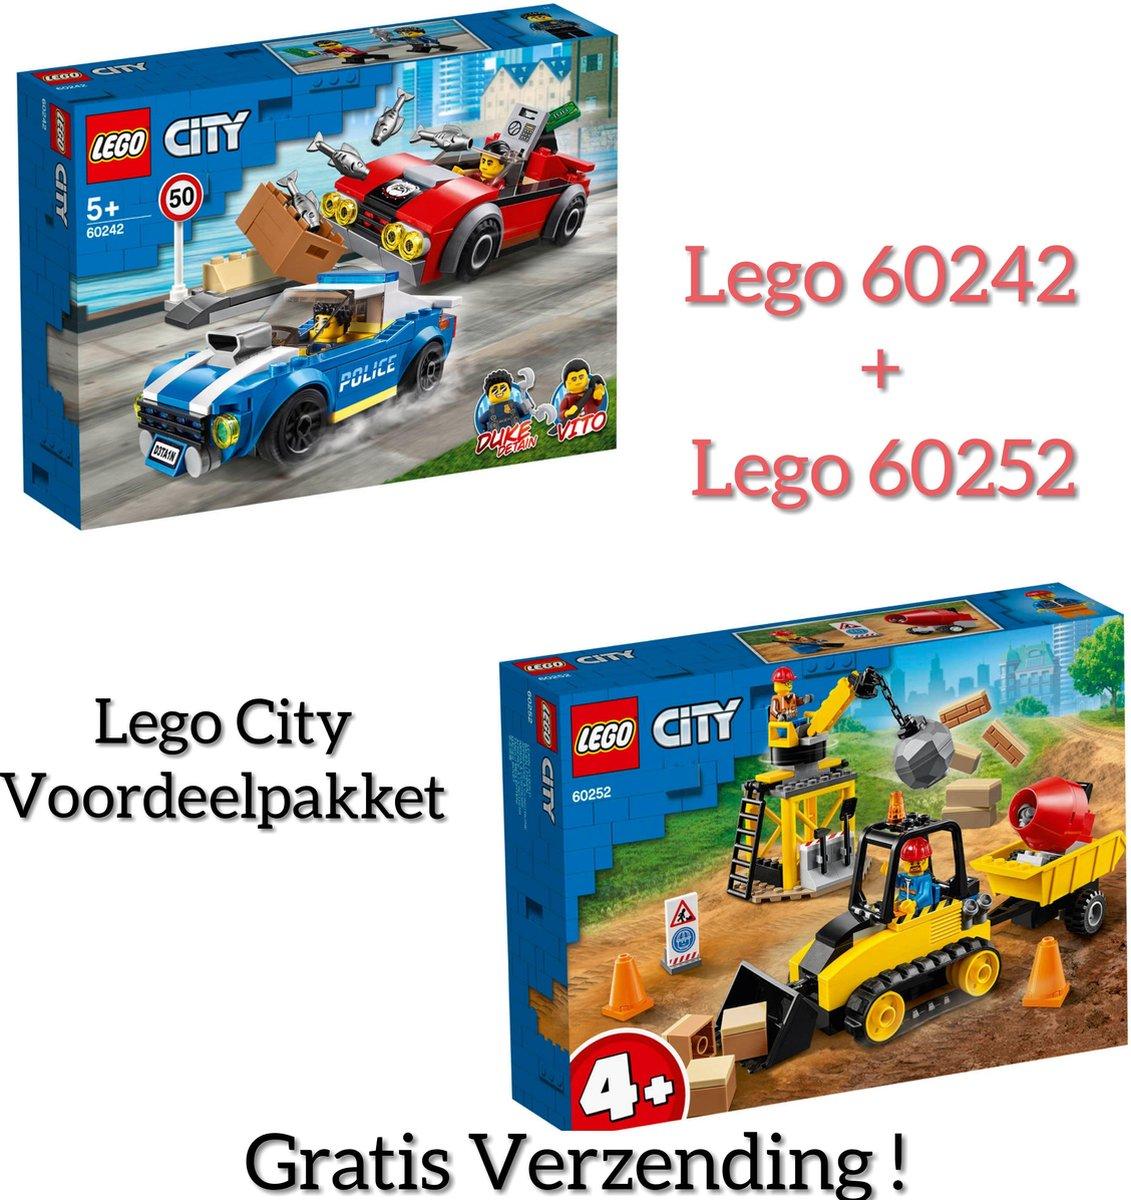 LEGO PAKKET LEGO CITY / LEGO City 4+ Constructiebulldozer - 60252 + LEGO City Politiearrest op de Snelweg - 60242